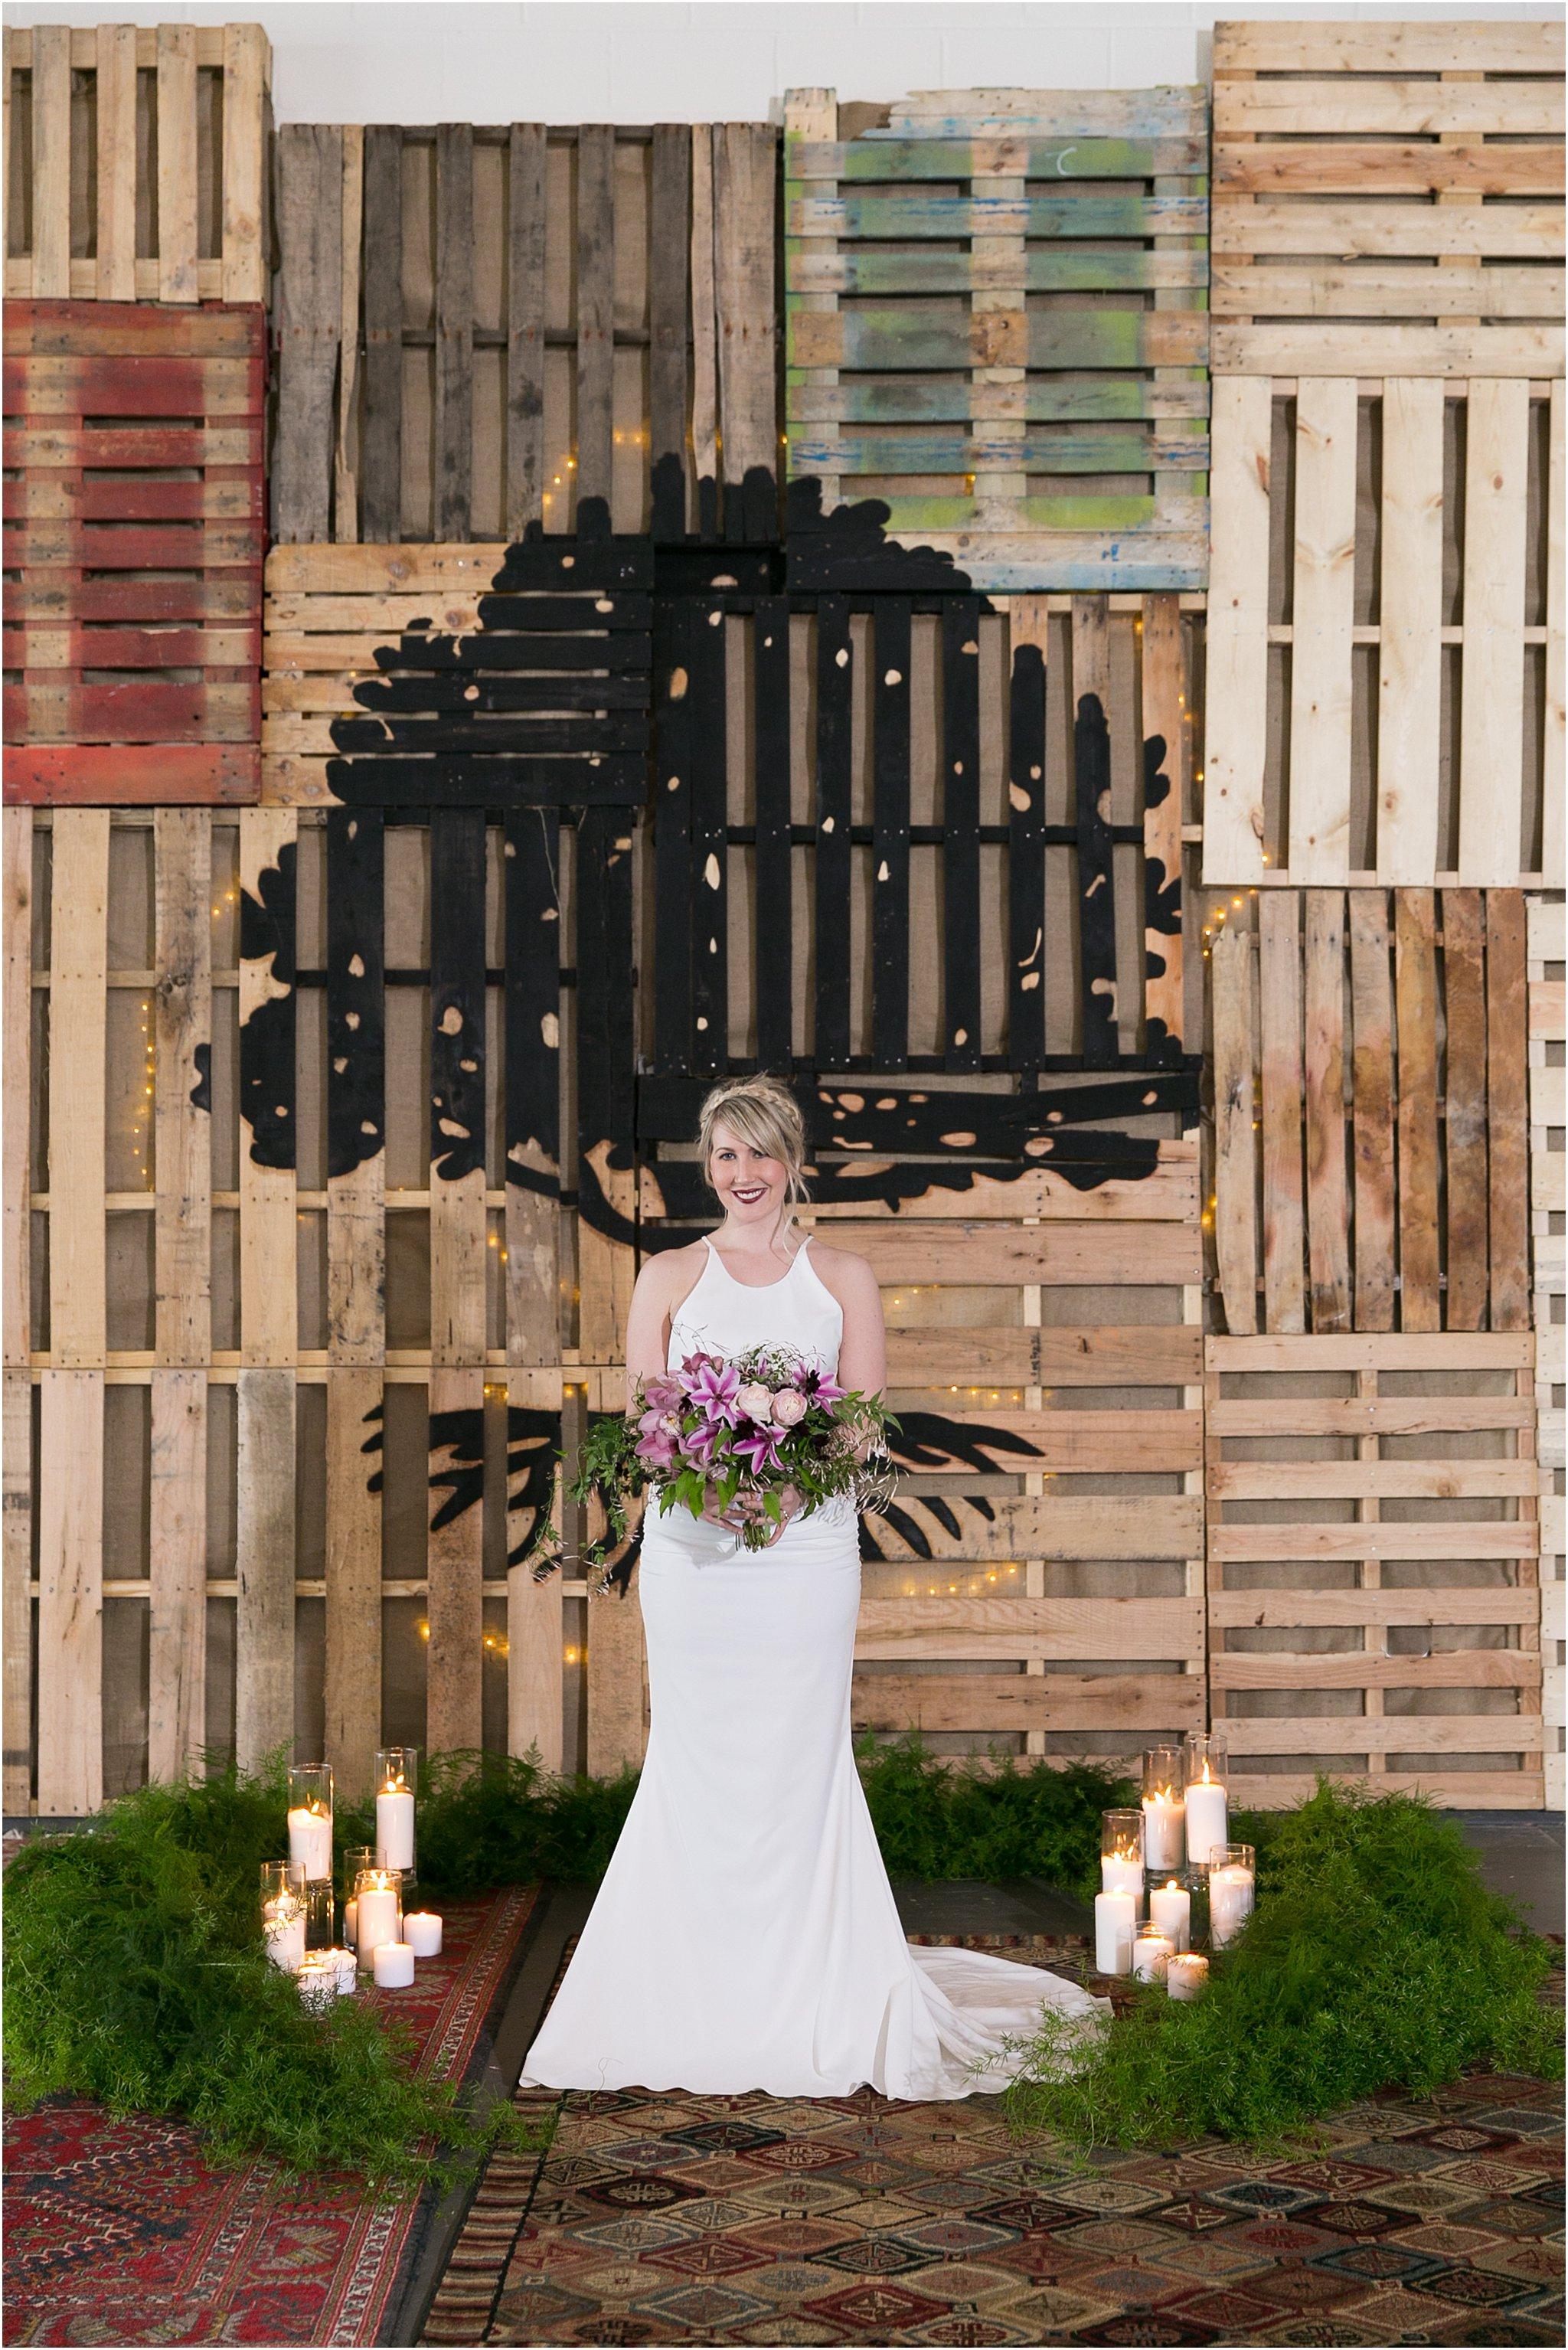 jessica_ryan_photography_oconnor_brewing_wedding_oconnor_brewing_co_norfolk_virginia_roost_flowers_blue_birds_garage__0788